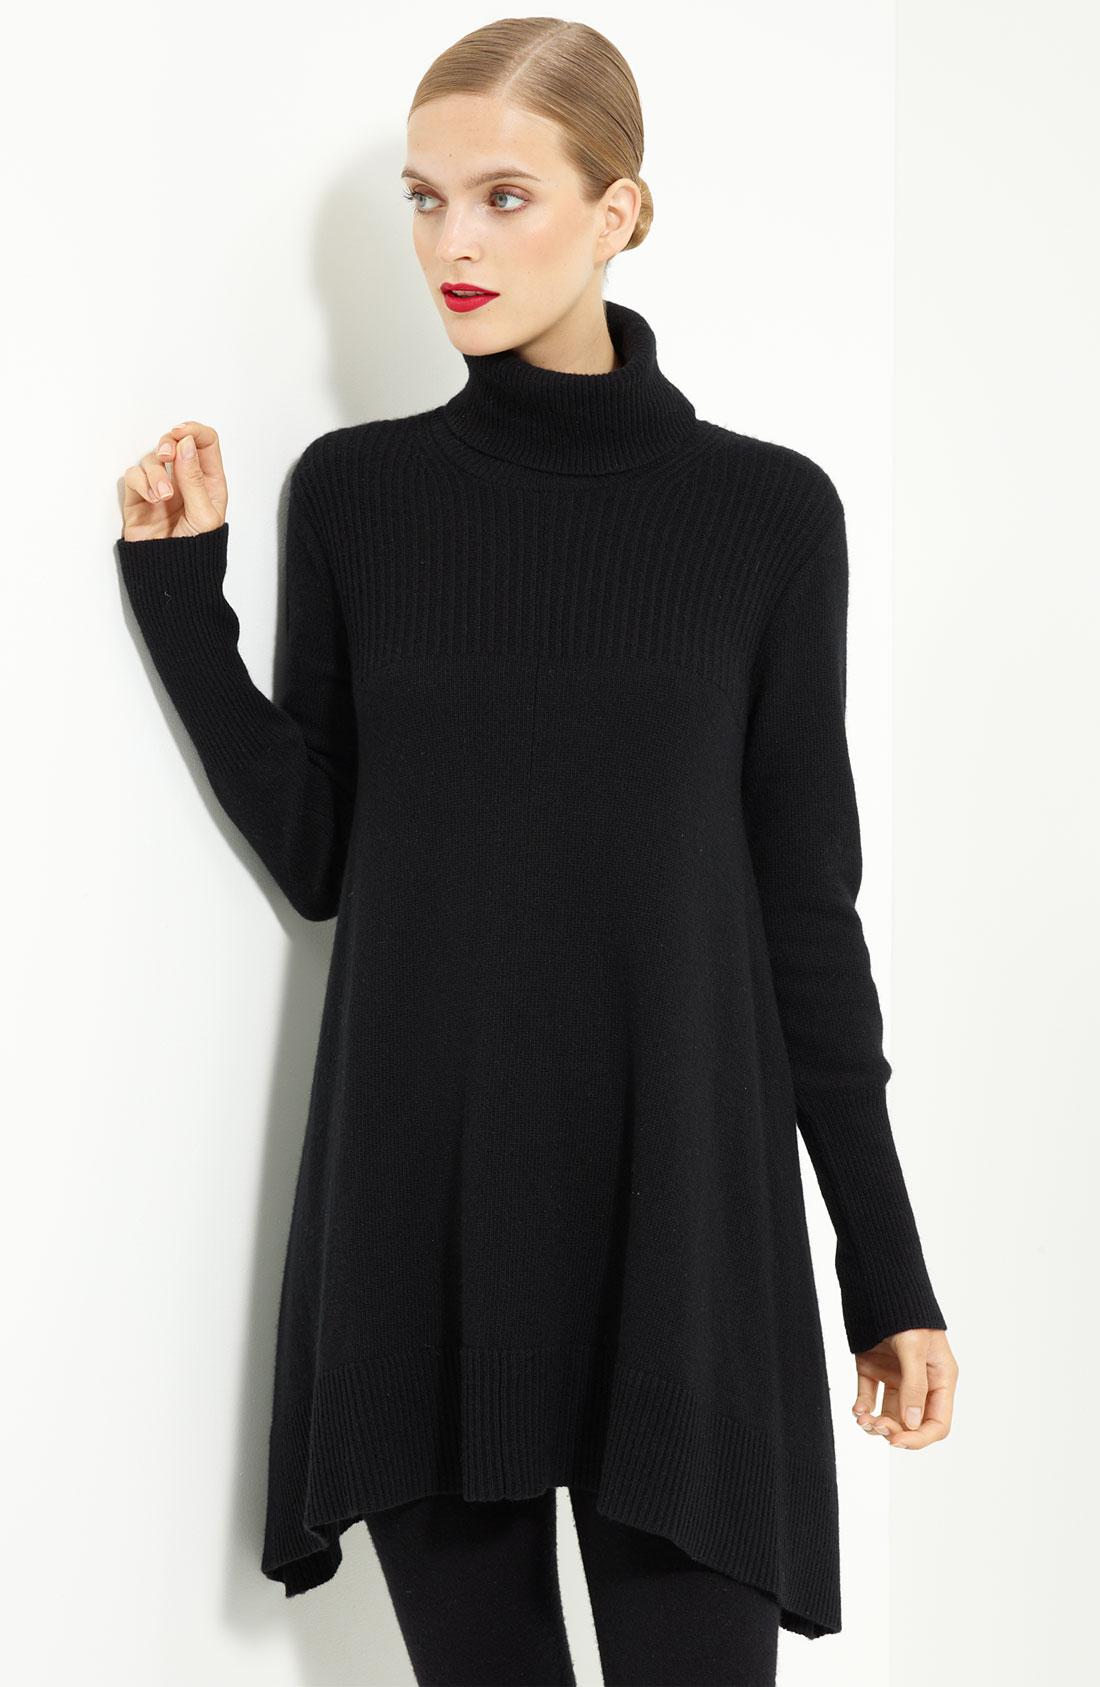 donna karan new york collection cashmere tunic in black lyst. Black Bedroom Furniture Sets. Home Design Ideas